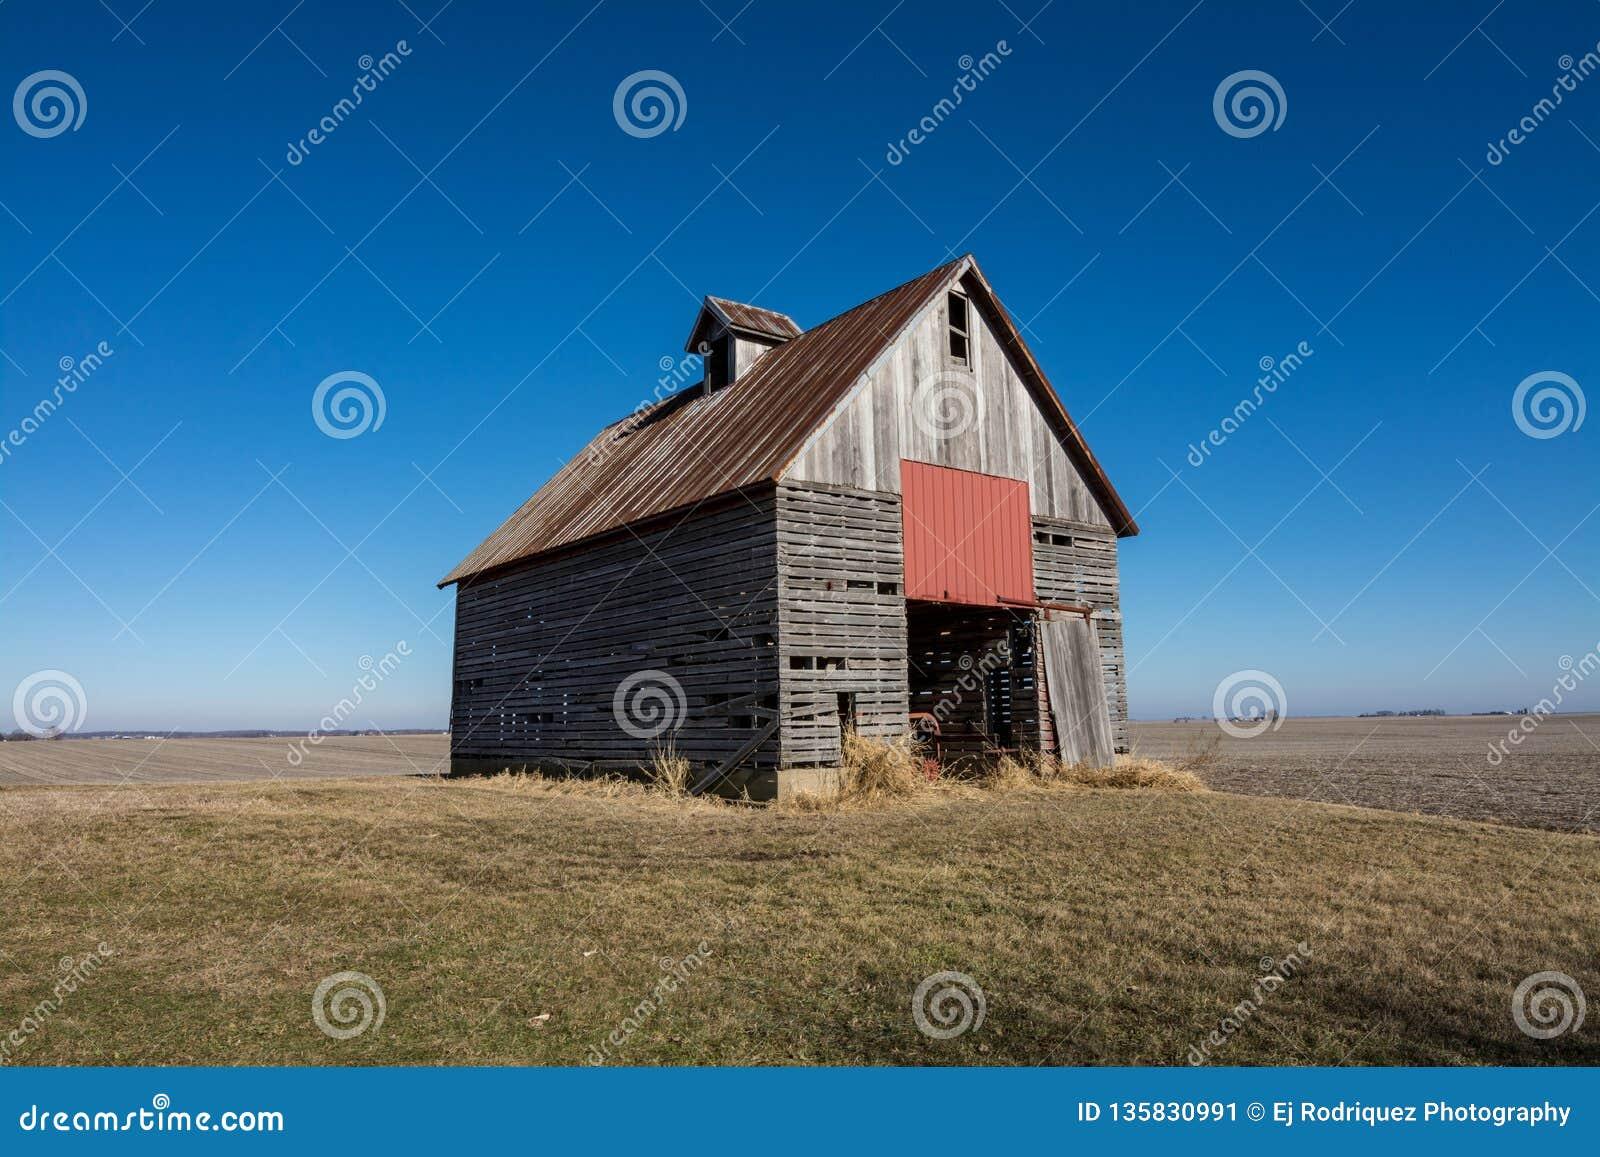 Celeiro de madeira isolado no nanowatt rural Illinois, EUA